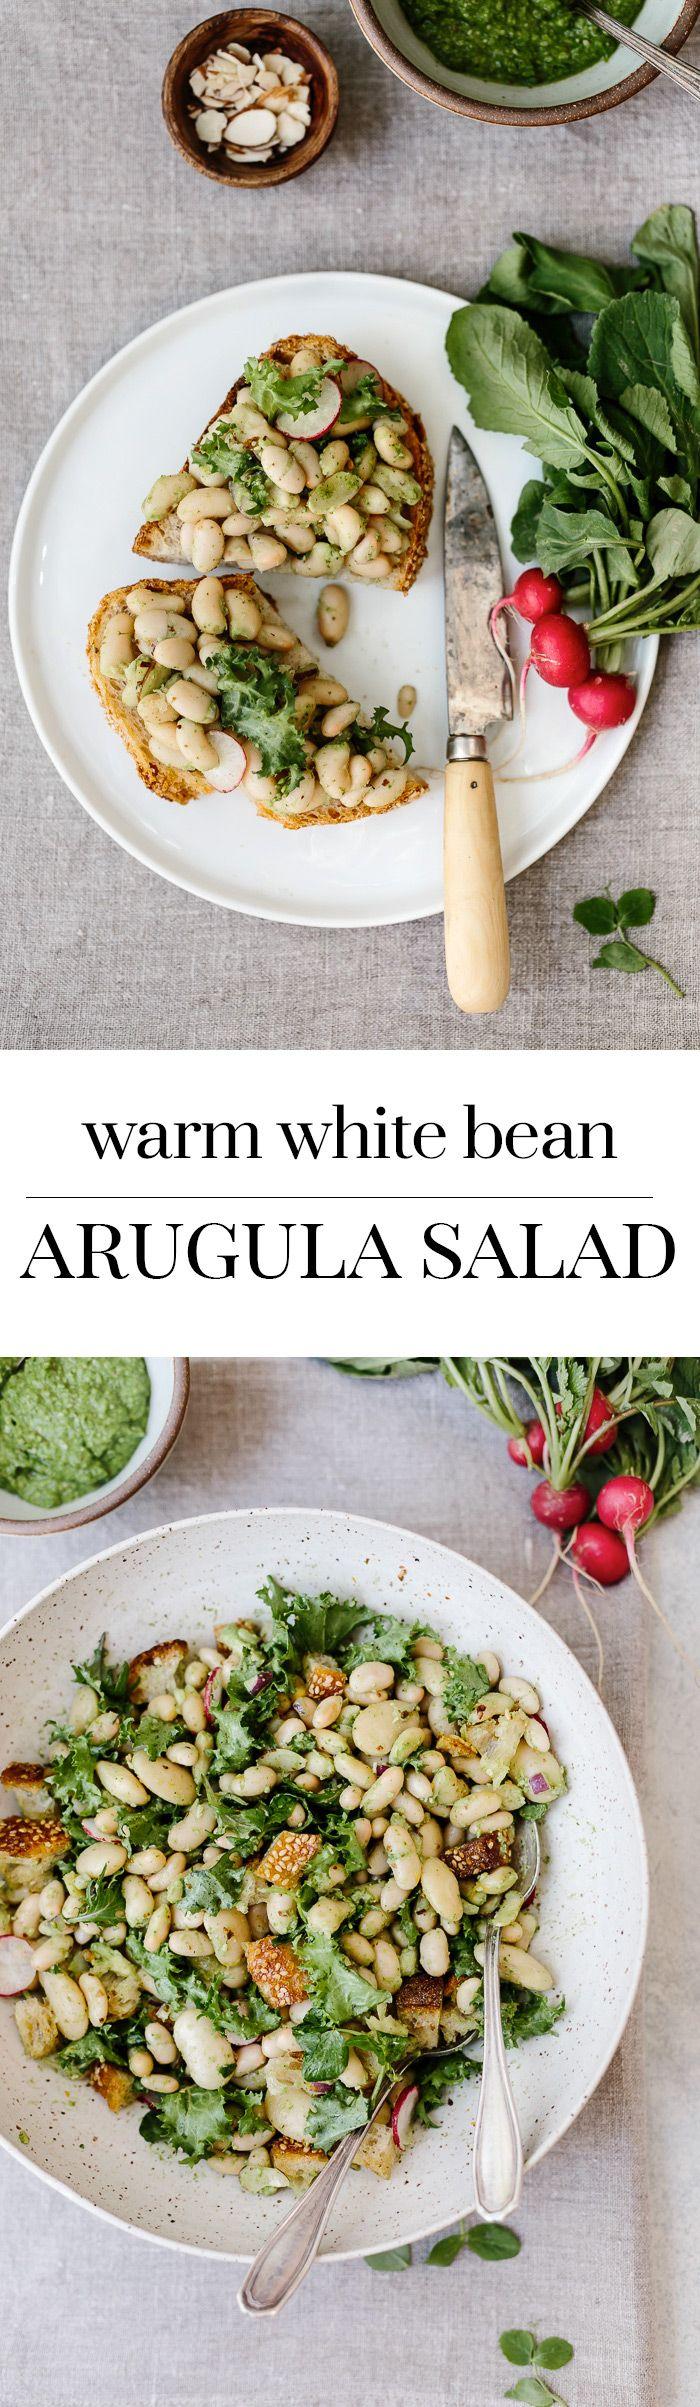 Warm White Bean Arugula Salad: A Salad recipe made with mixing warm cannelini beans with arugula pesto.